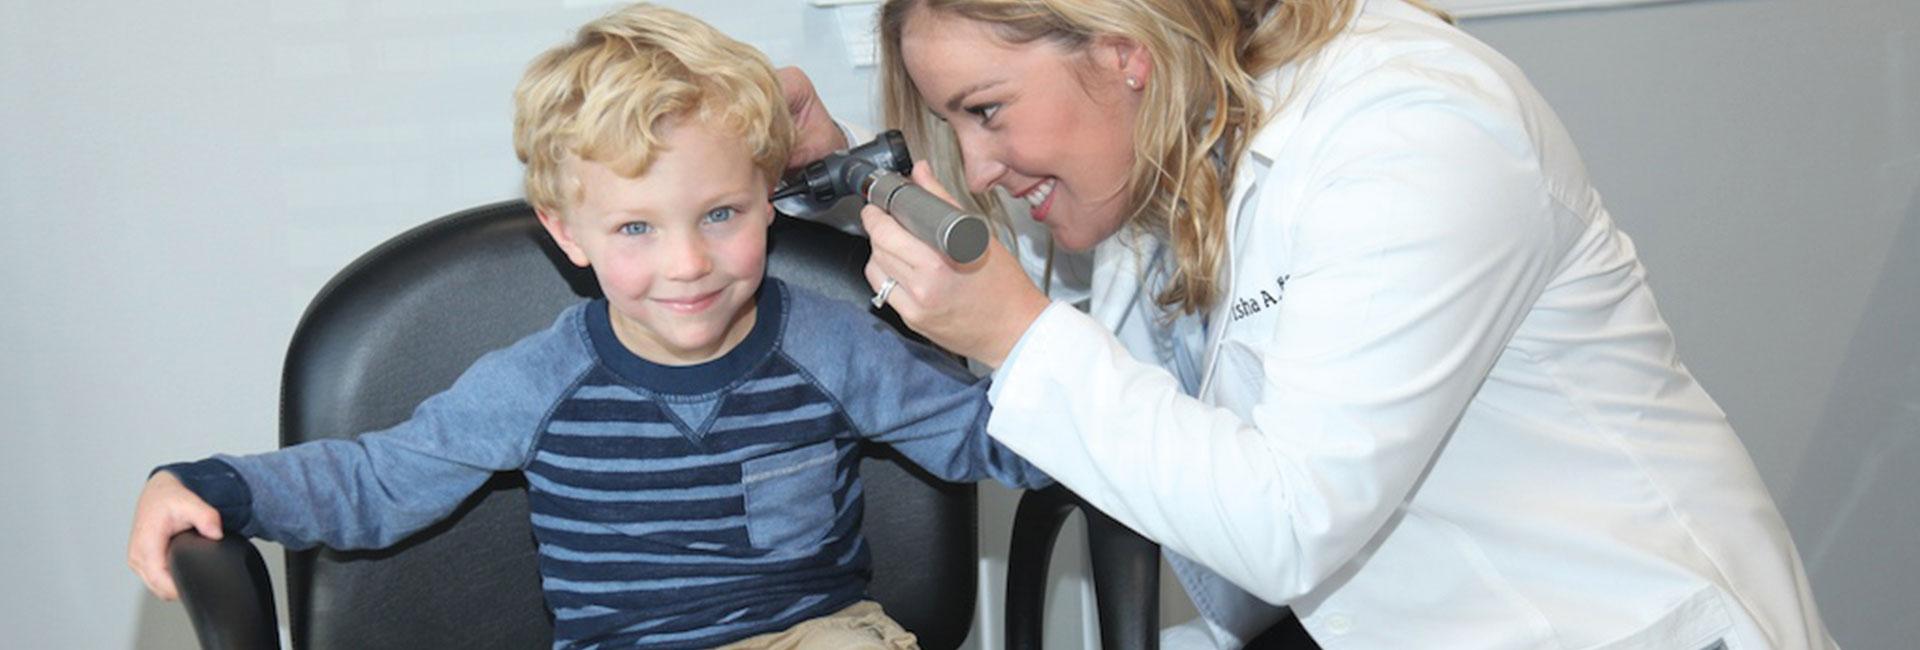 audiologists